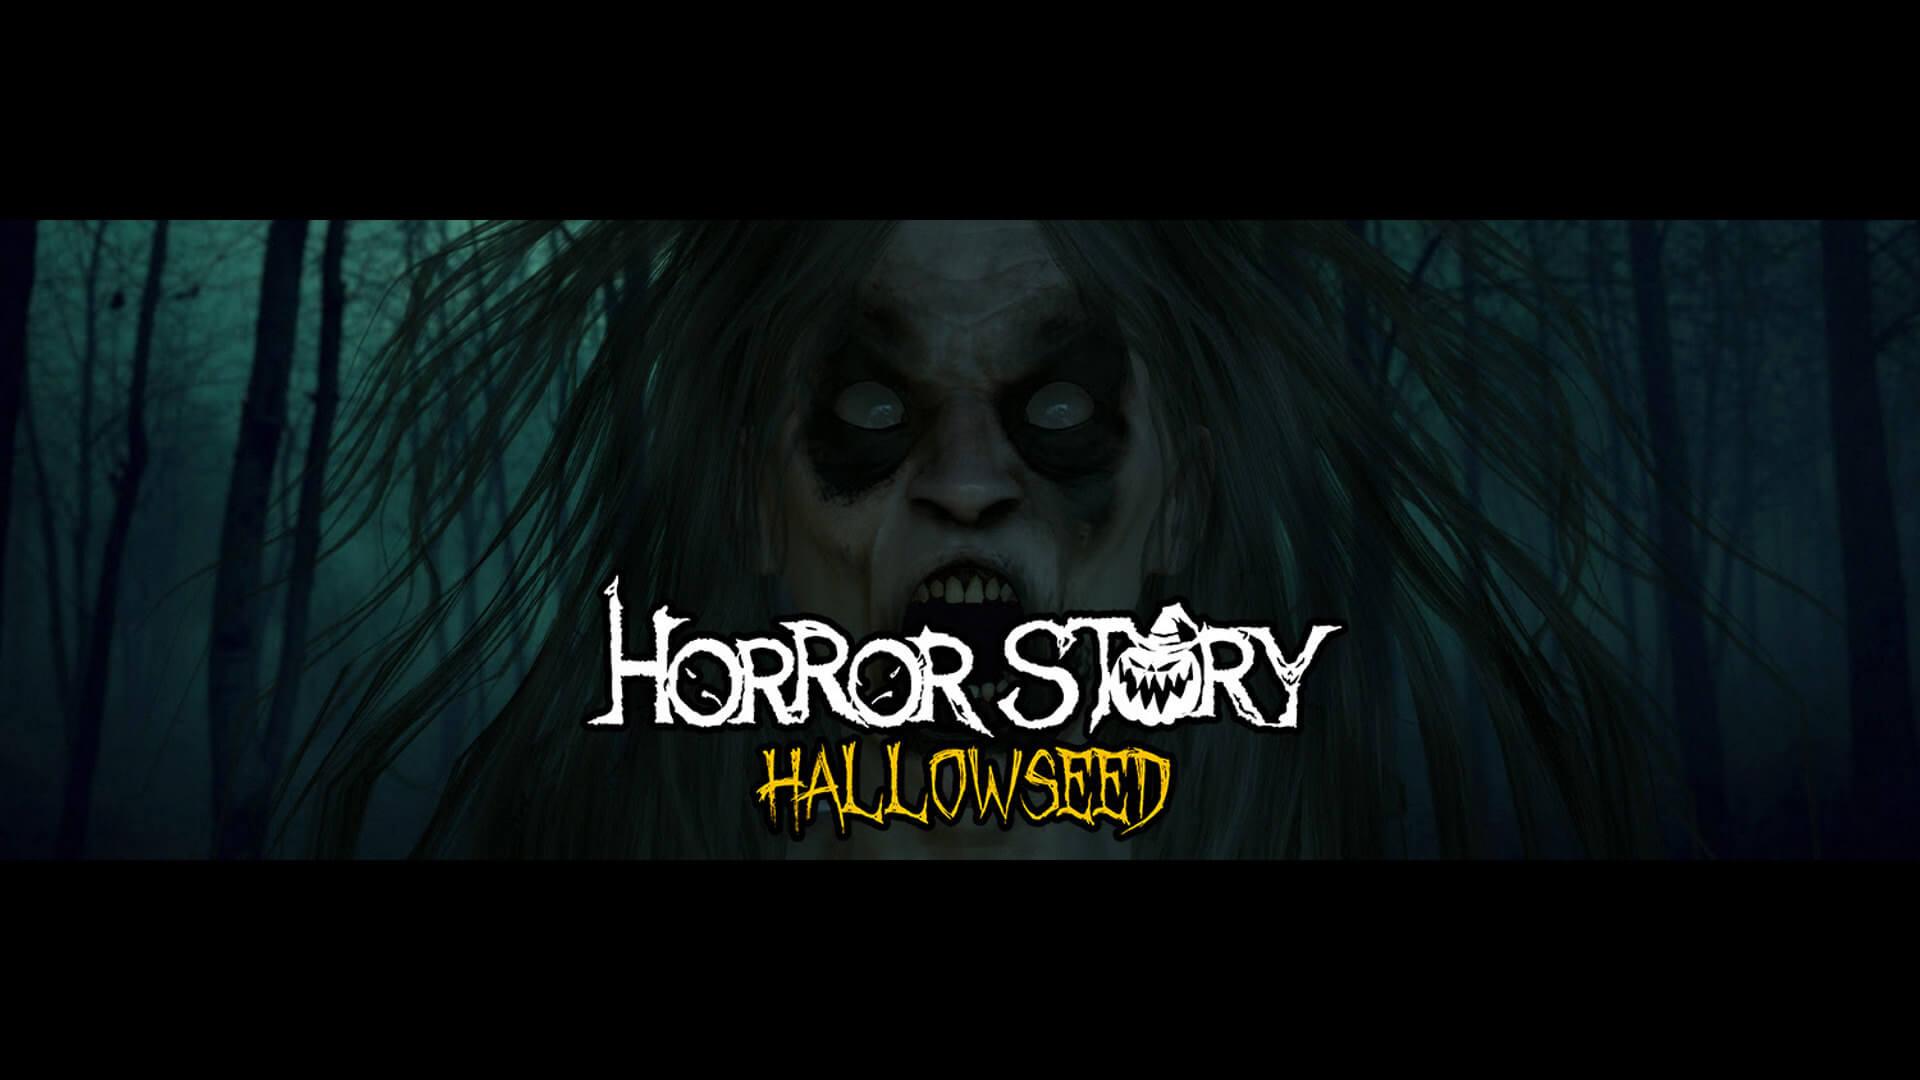 Horror Story: Hallowseed Splash Art